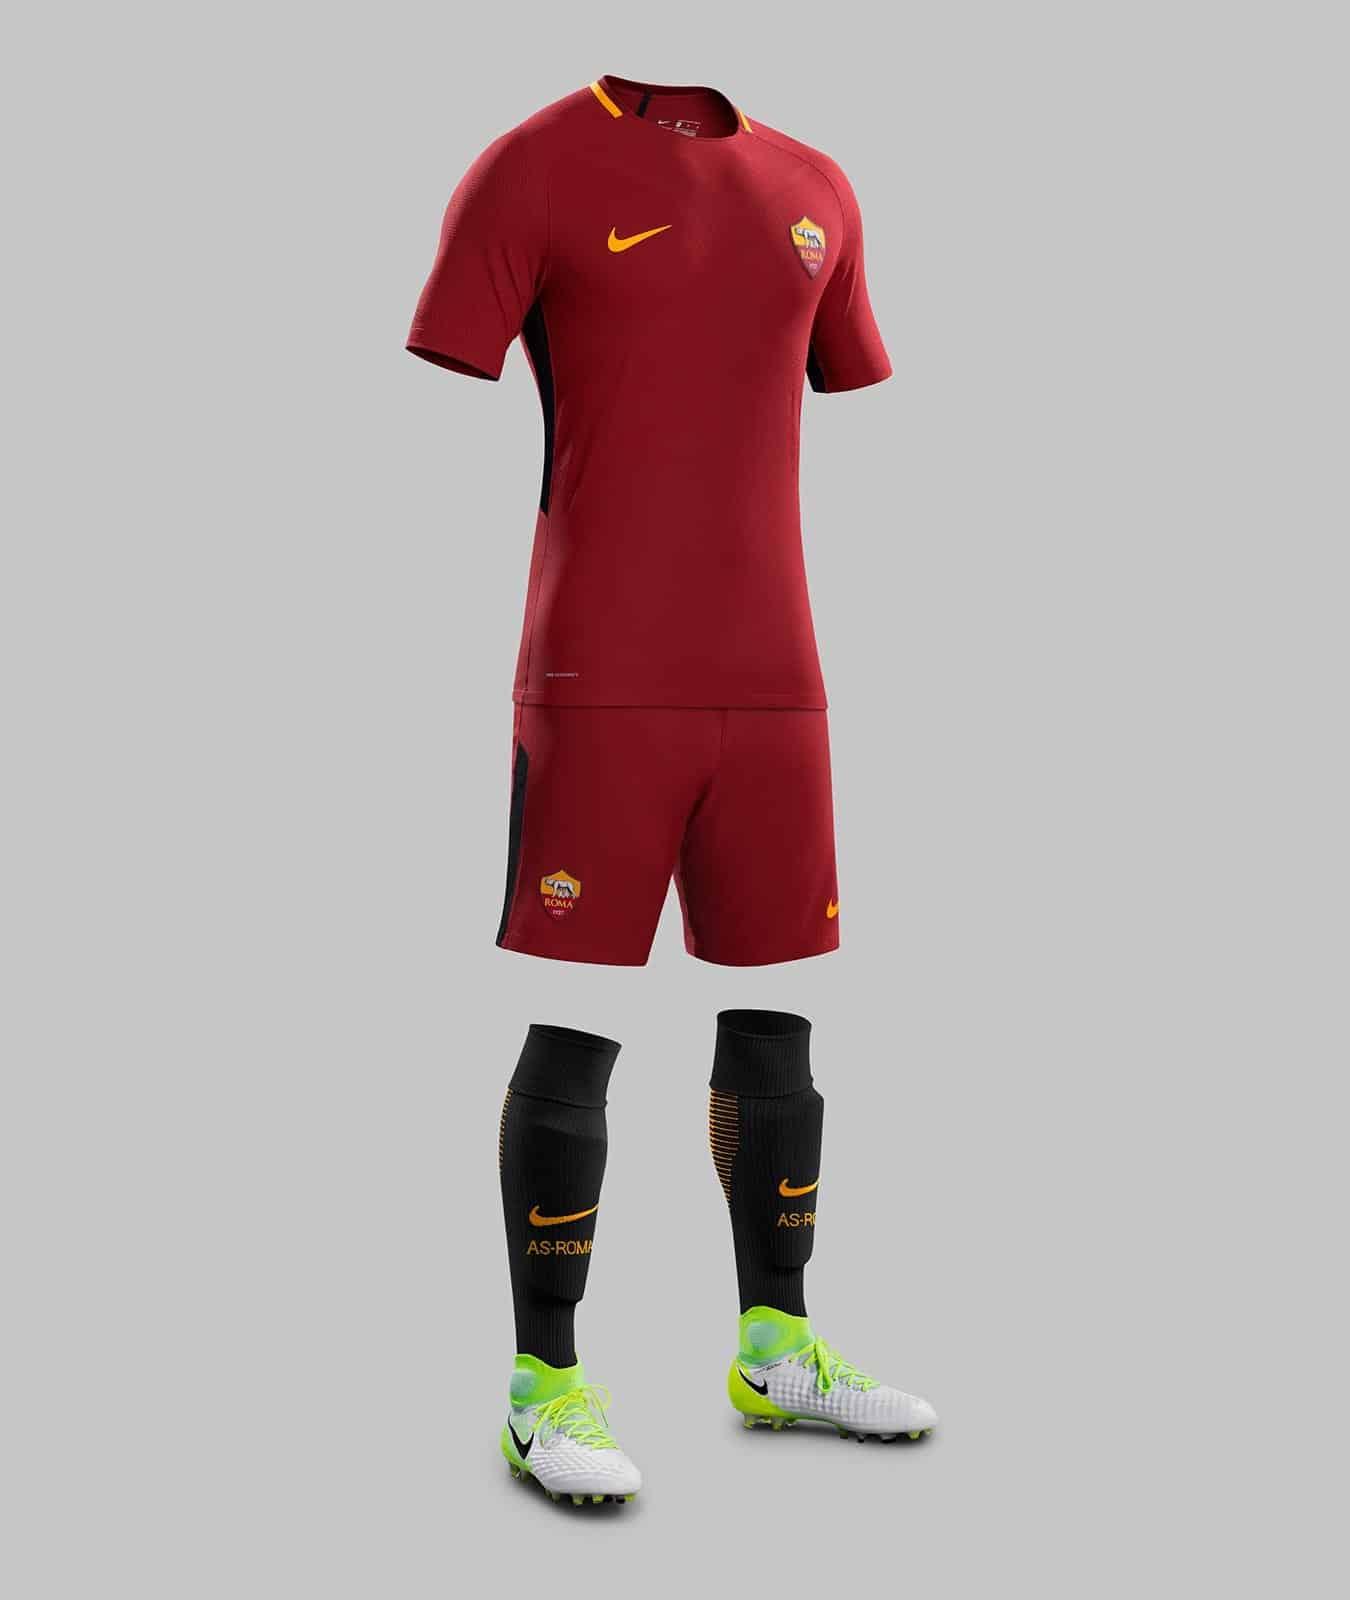 maillot-domicile-as-roma-2017-2018